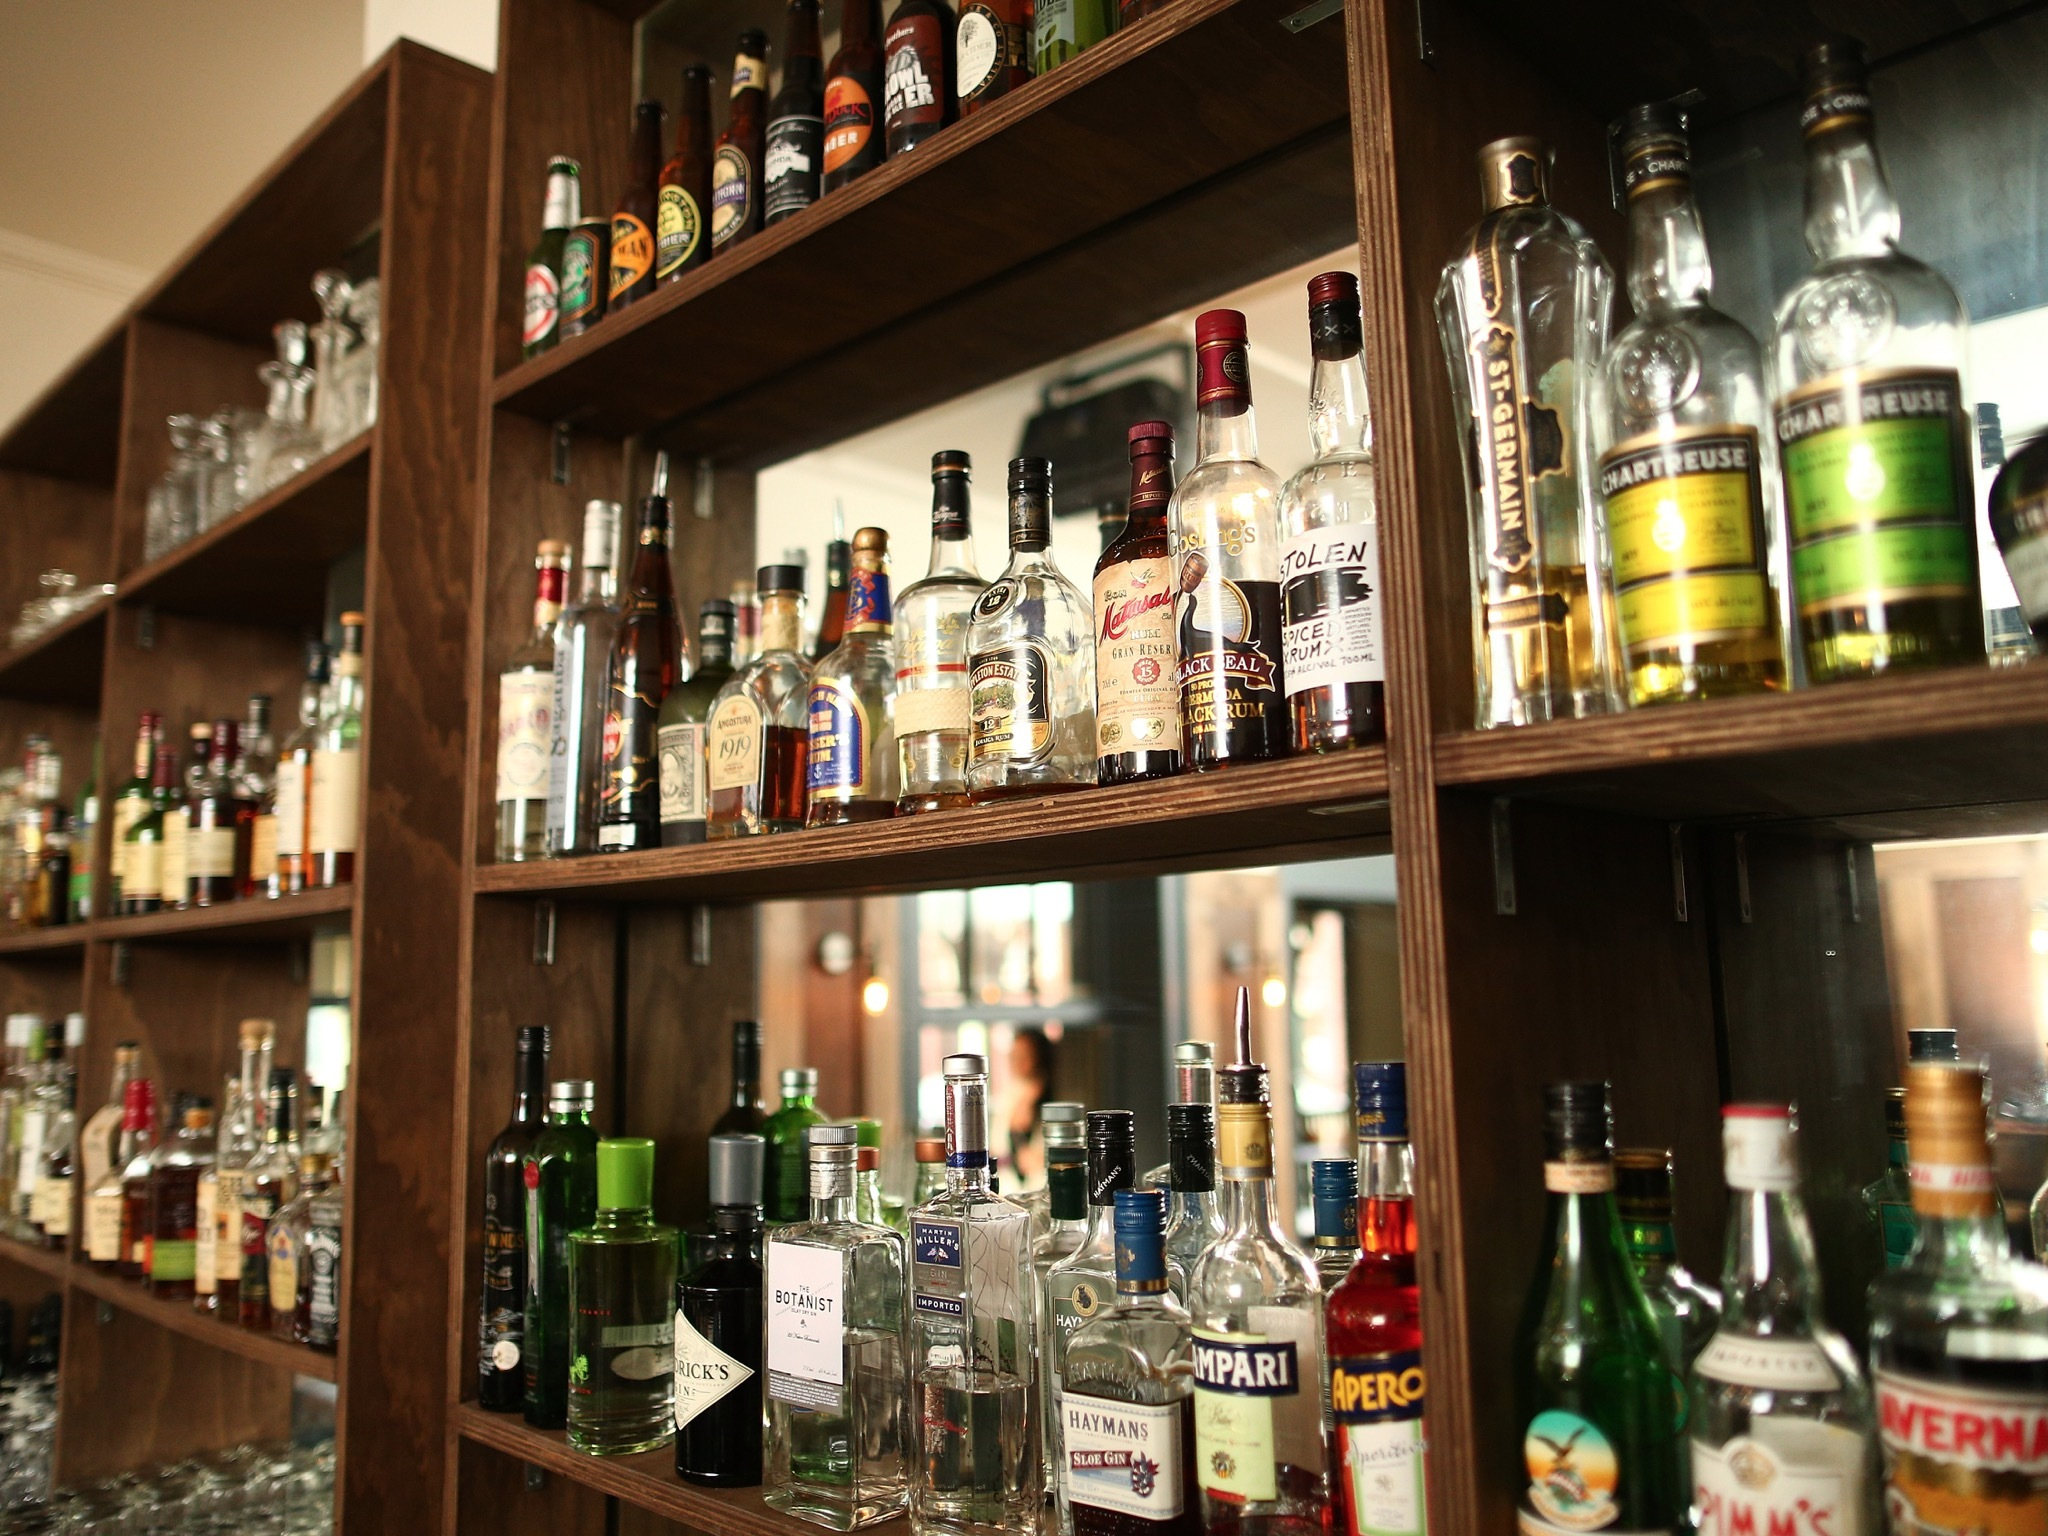 A shot of a shelving unit behind the bar full of spirit bottles